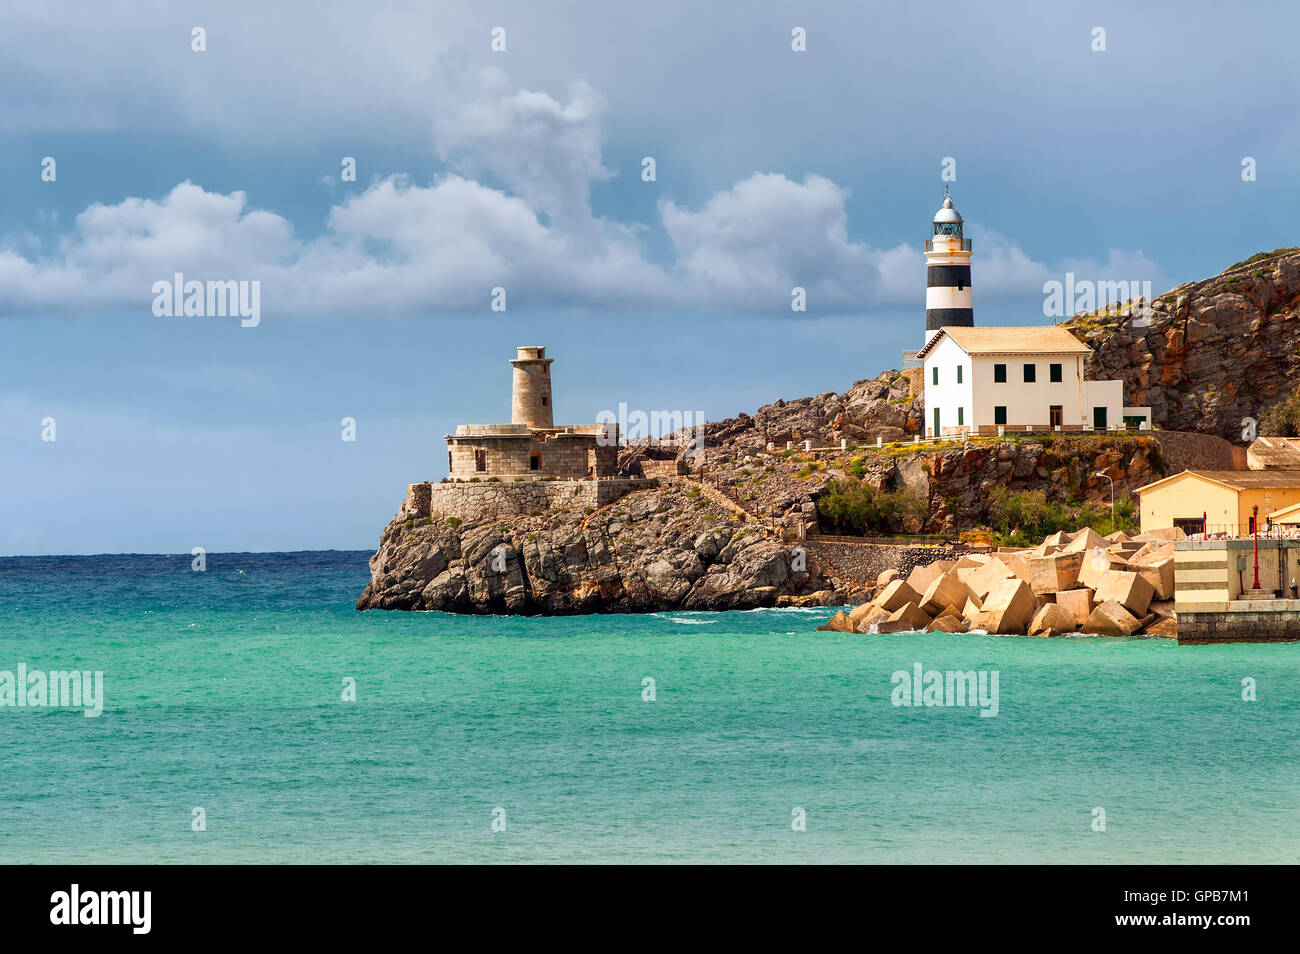 Lighthouse of Soler, Mediterranean Sea Coast, Mallorca, Spain - Stock Image